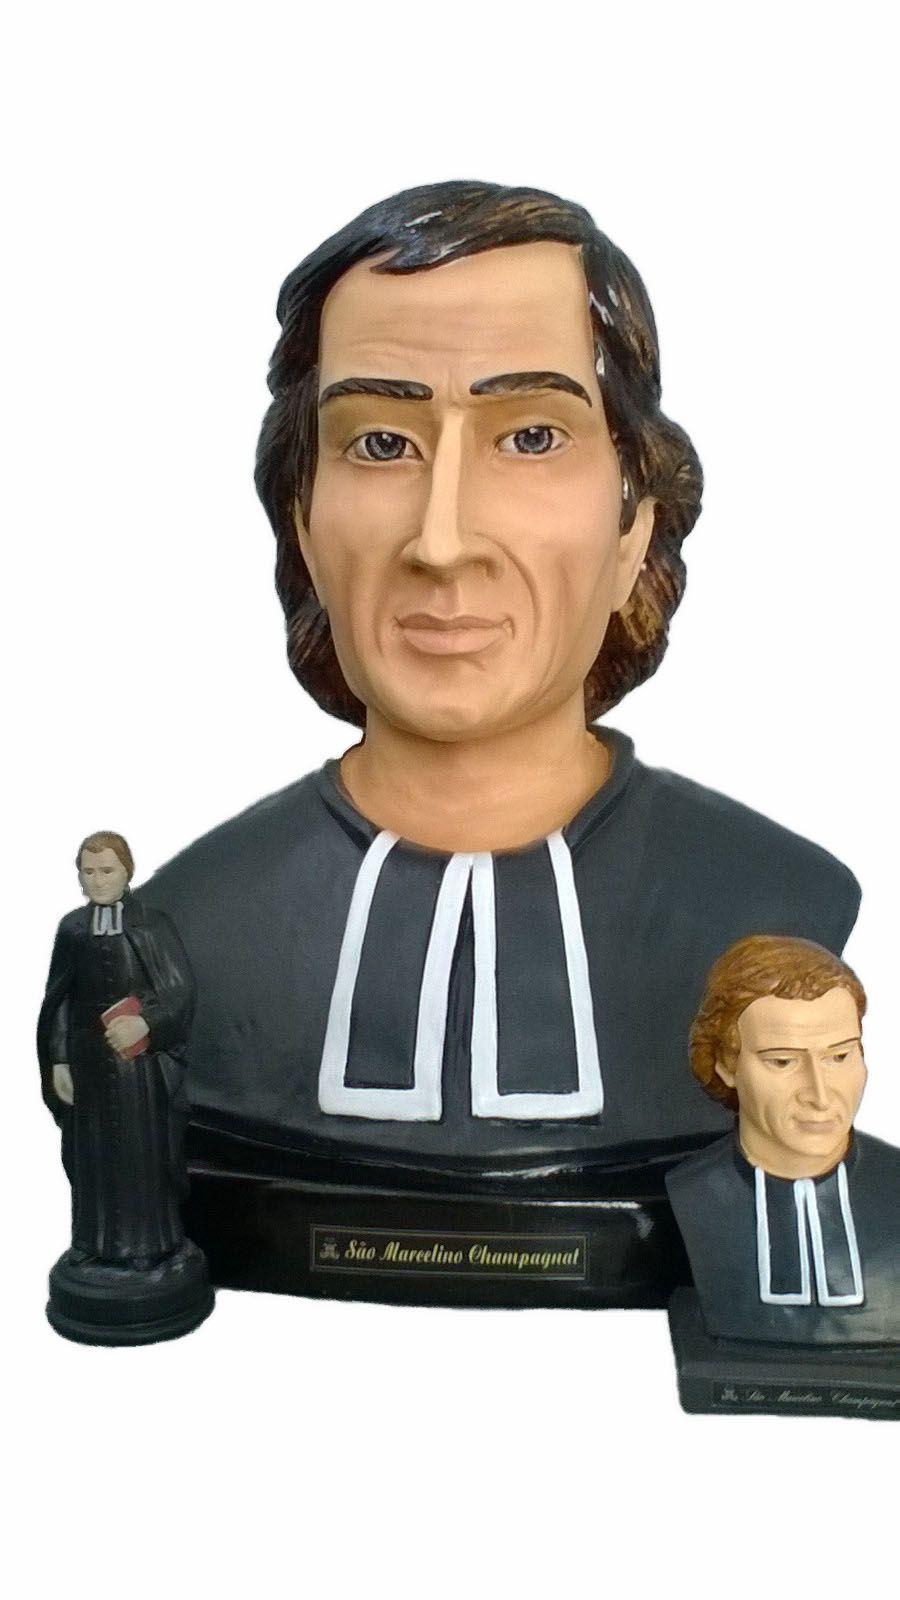 Busto de São Marcelino Champagnat - 60 cm